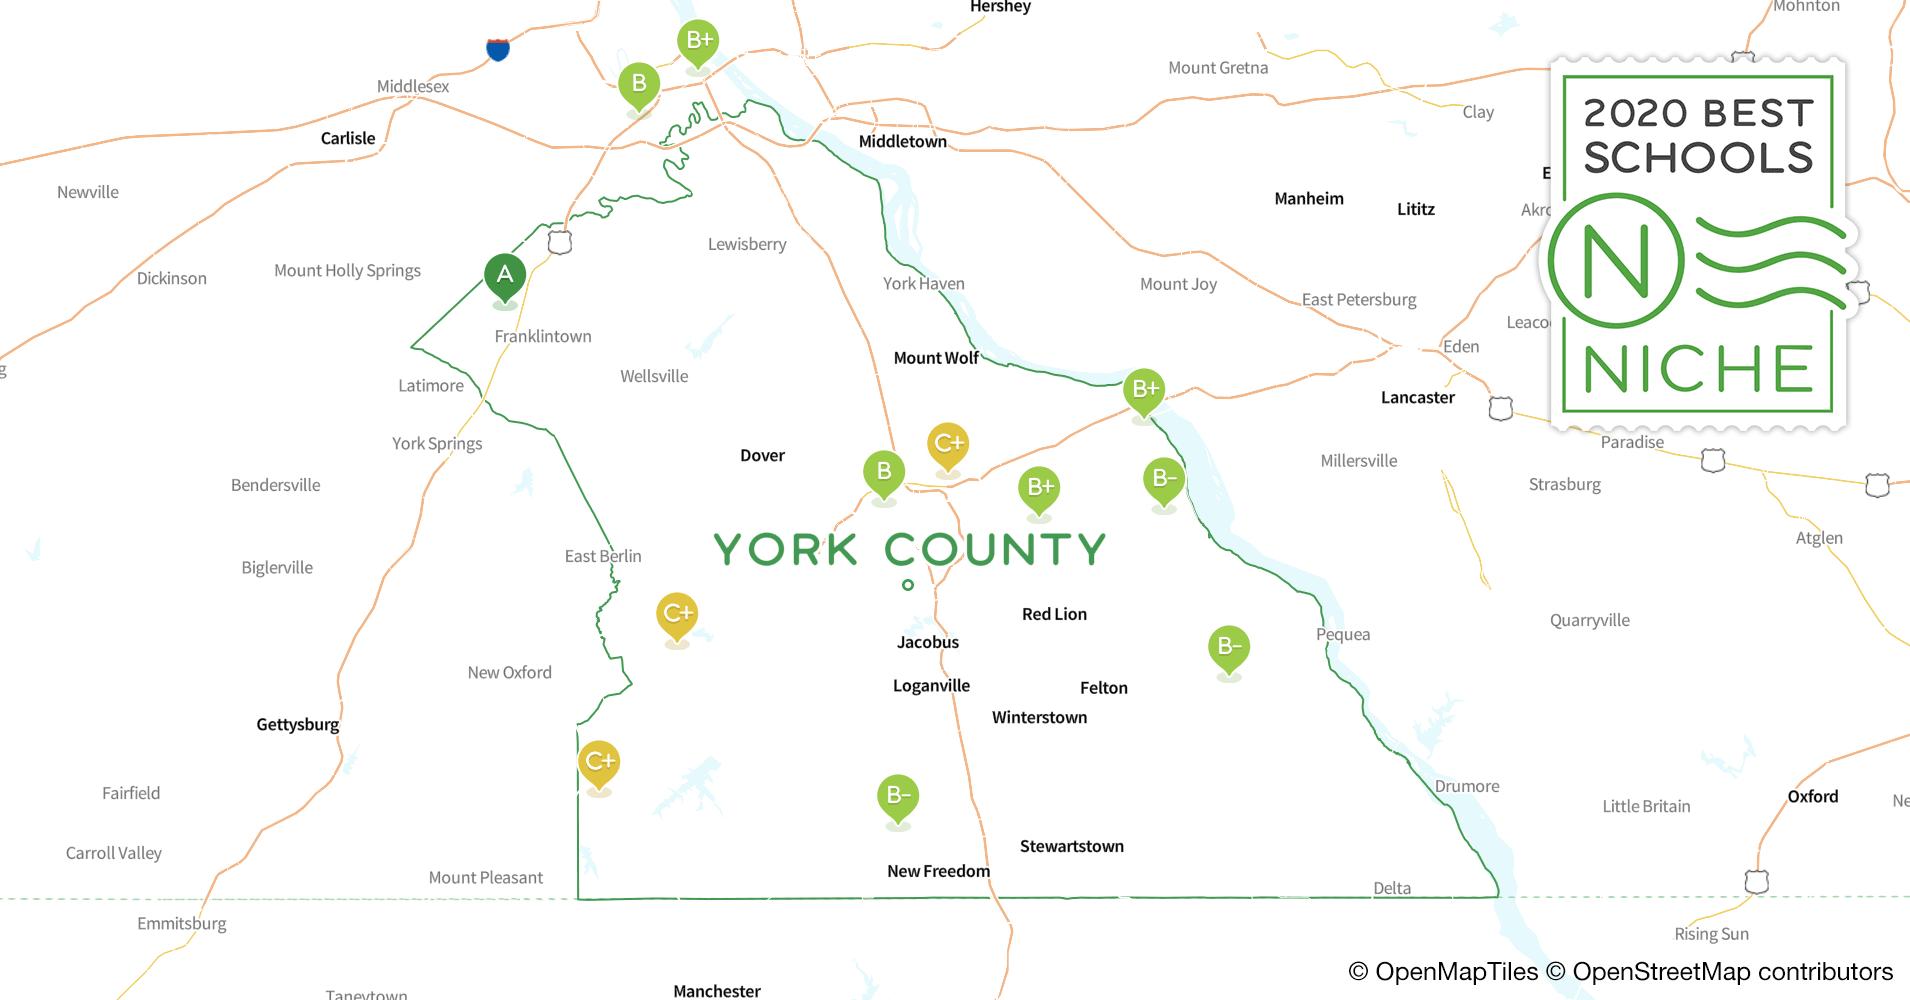 Best Pa Schools >> 2020 Best Public High Schools In York County Pa Niche